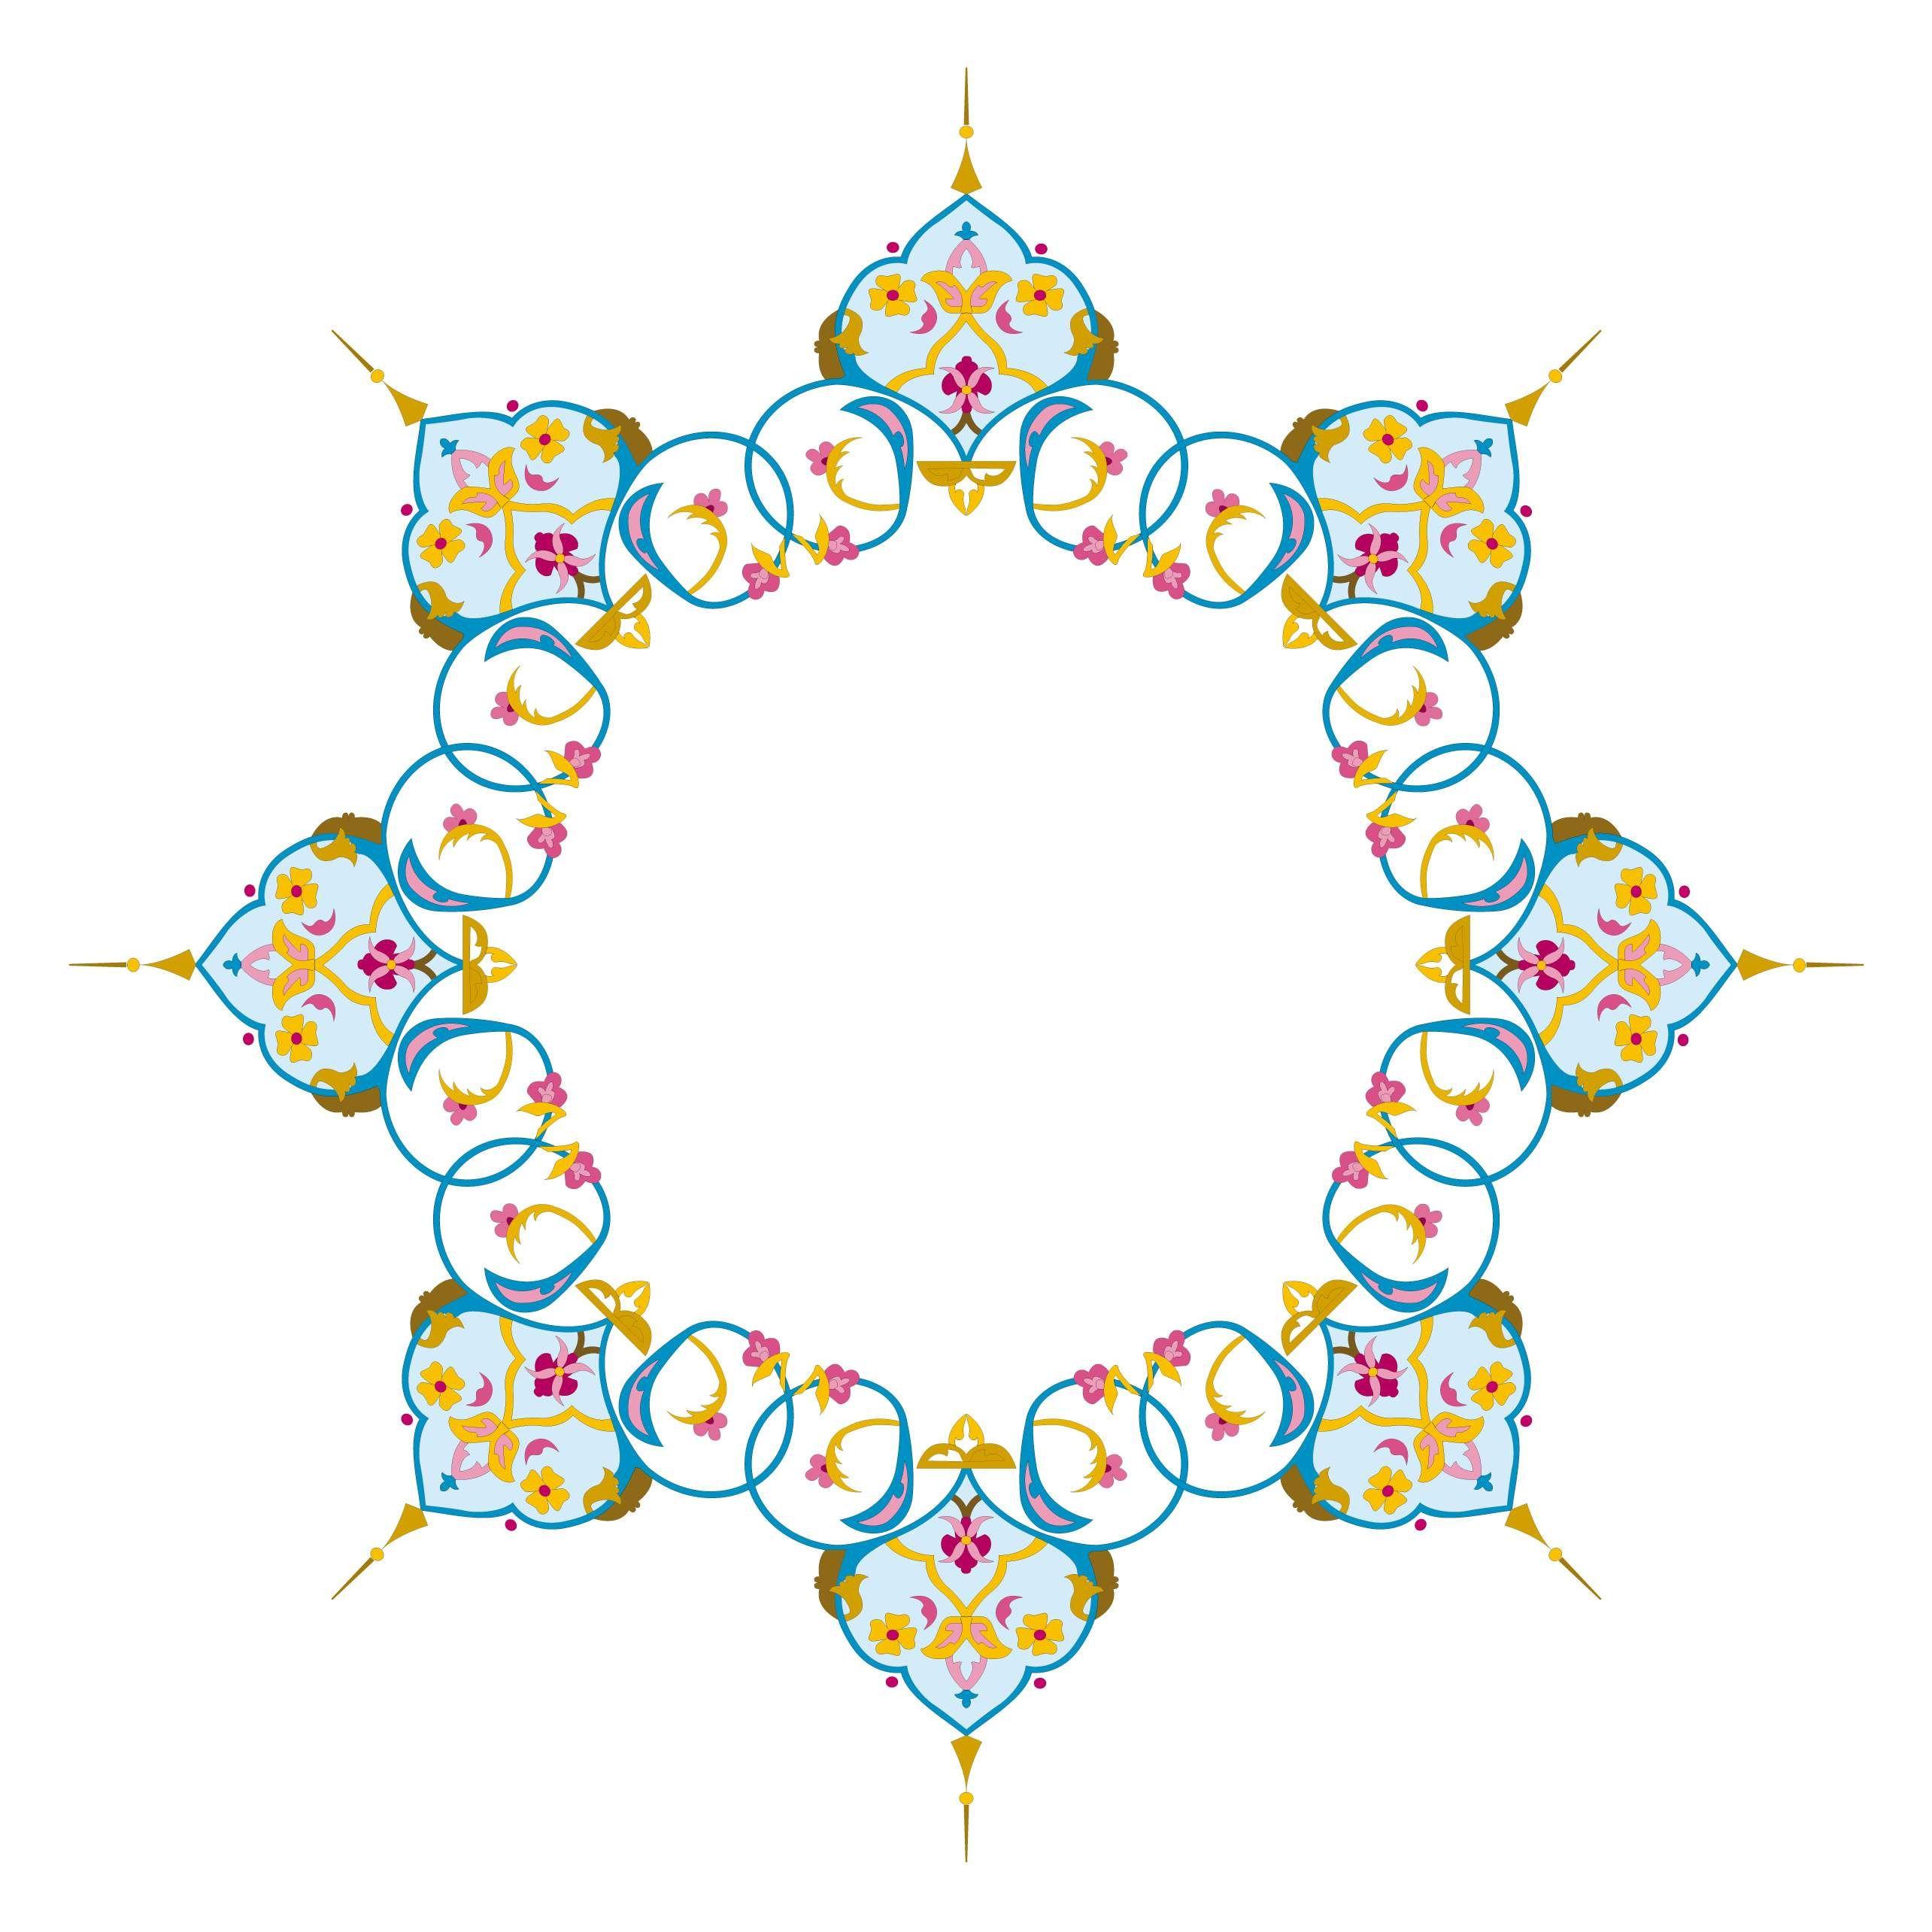 زخارف دائرية رائعة Abstract Symbols Peace Symbol